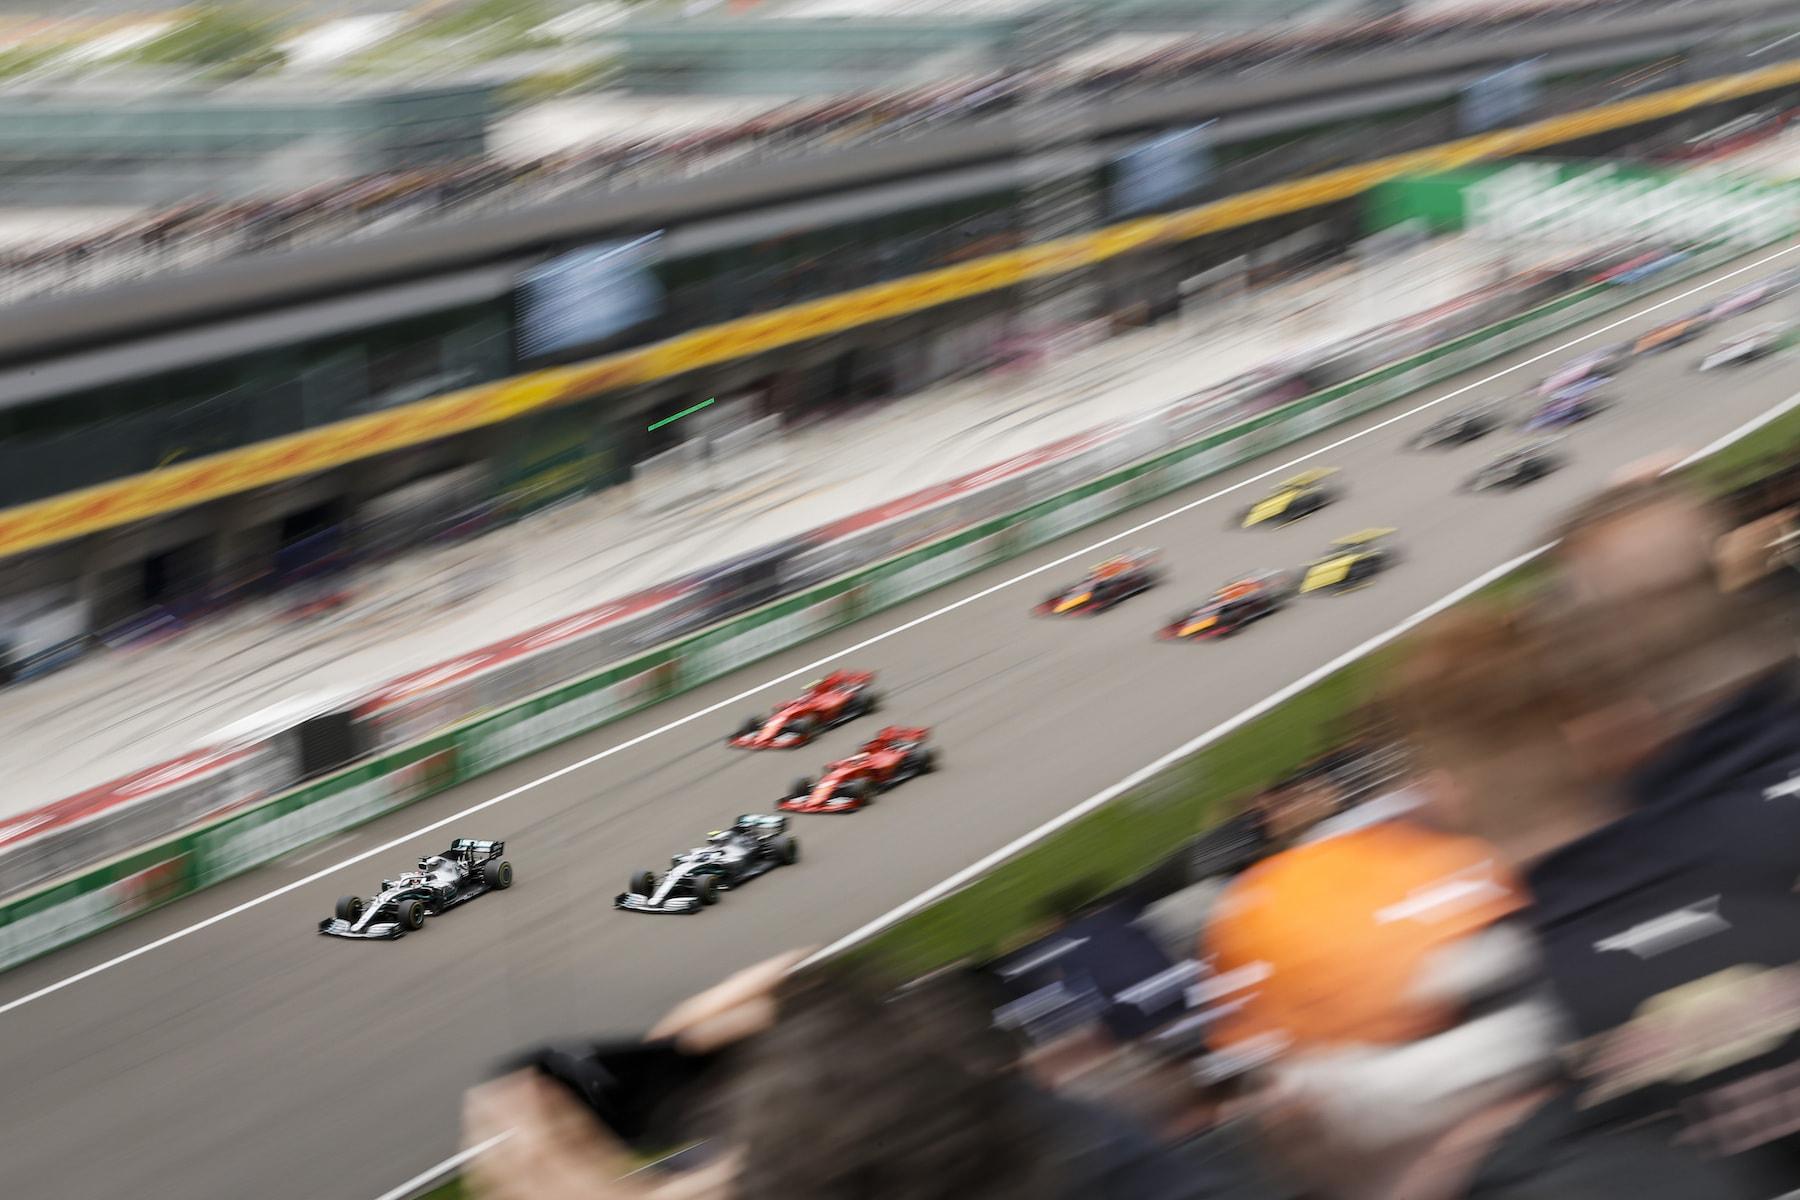 3 2019 Chinese GP start 3 copy.jpg